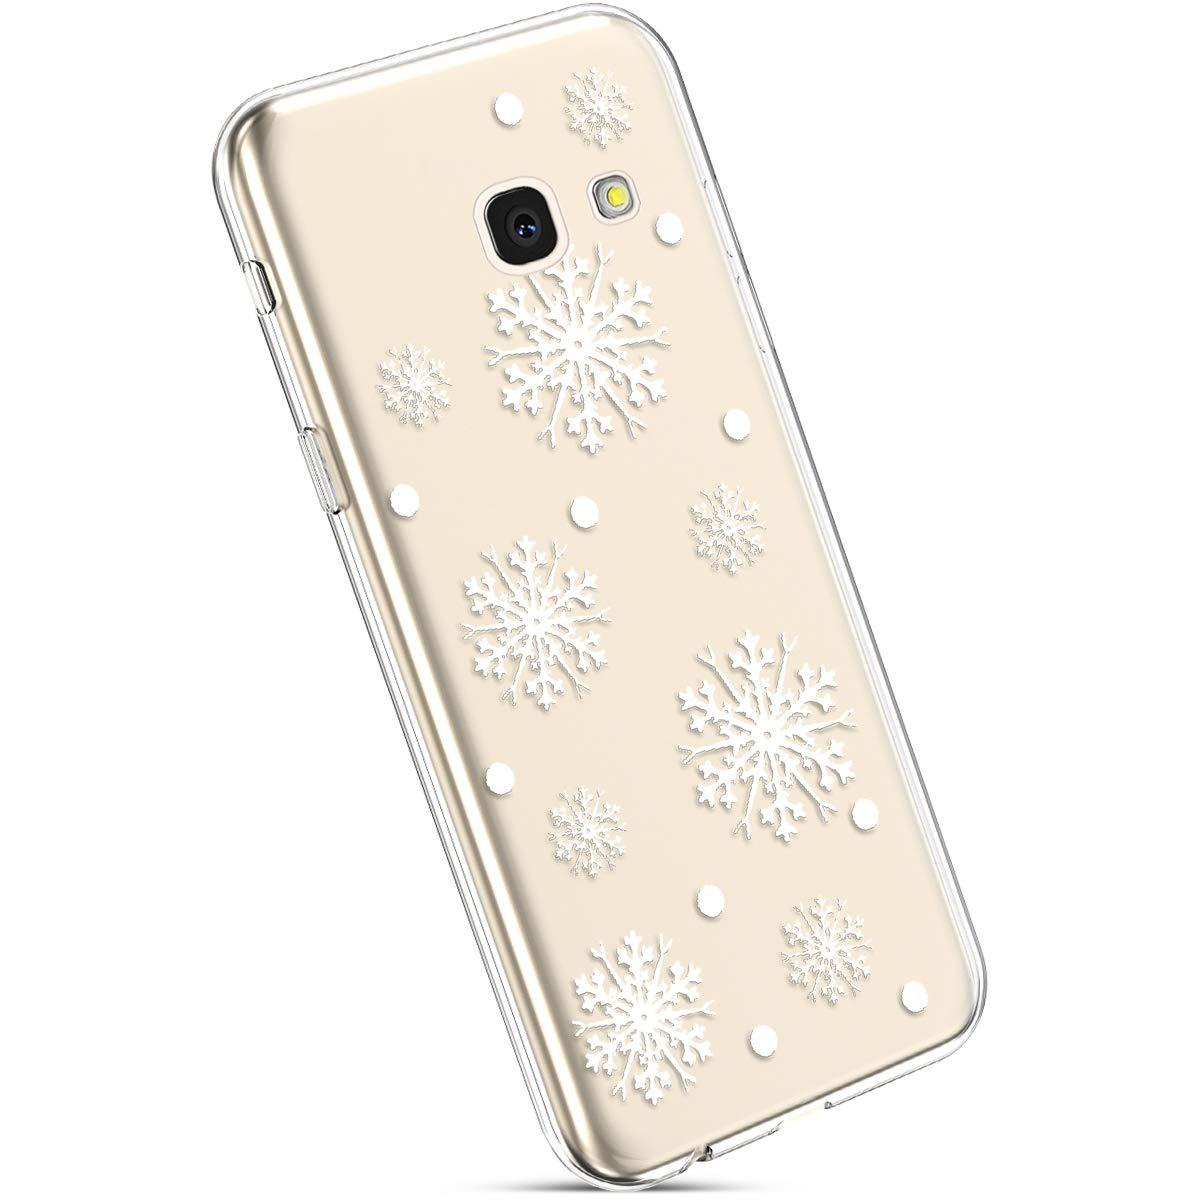 YSIMEE Custodia Samsung Galaxy J4 Plus, Xmas Decorazioni Natalizie Custodie Gel Trasparente Silicone Morbida Ultra Sottile Chiaro TPU Antiurto Gomma Cover per Samsung J4 Plus -Luce